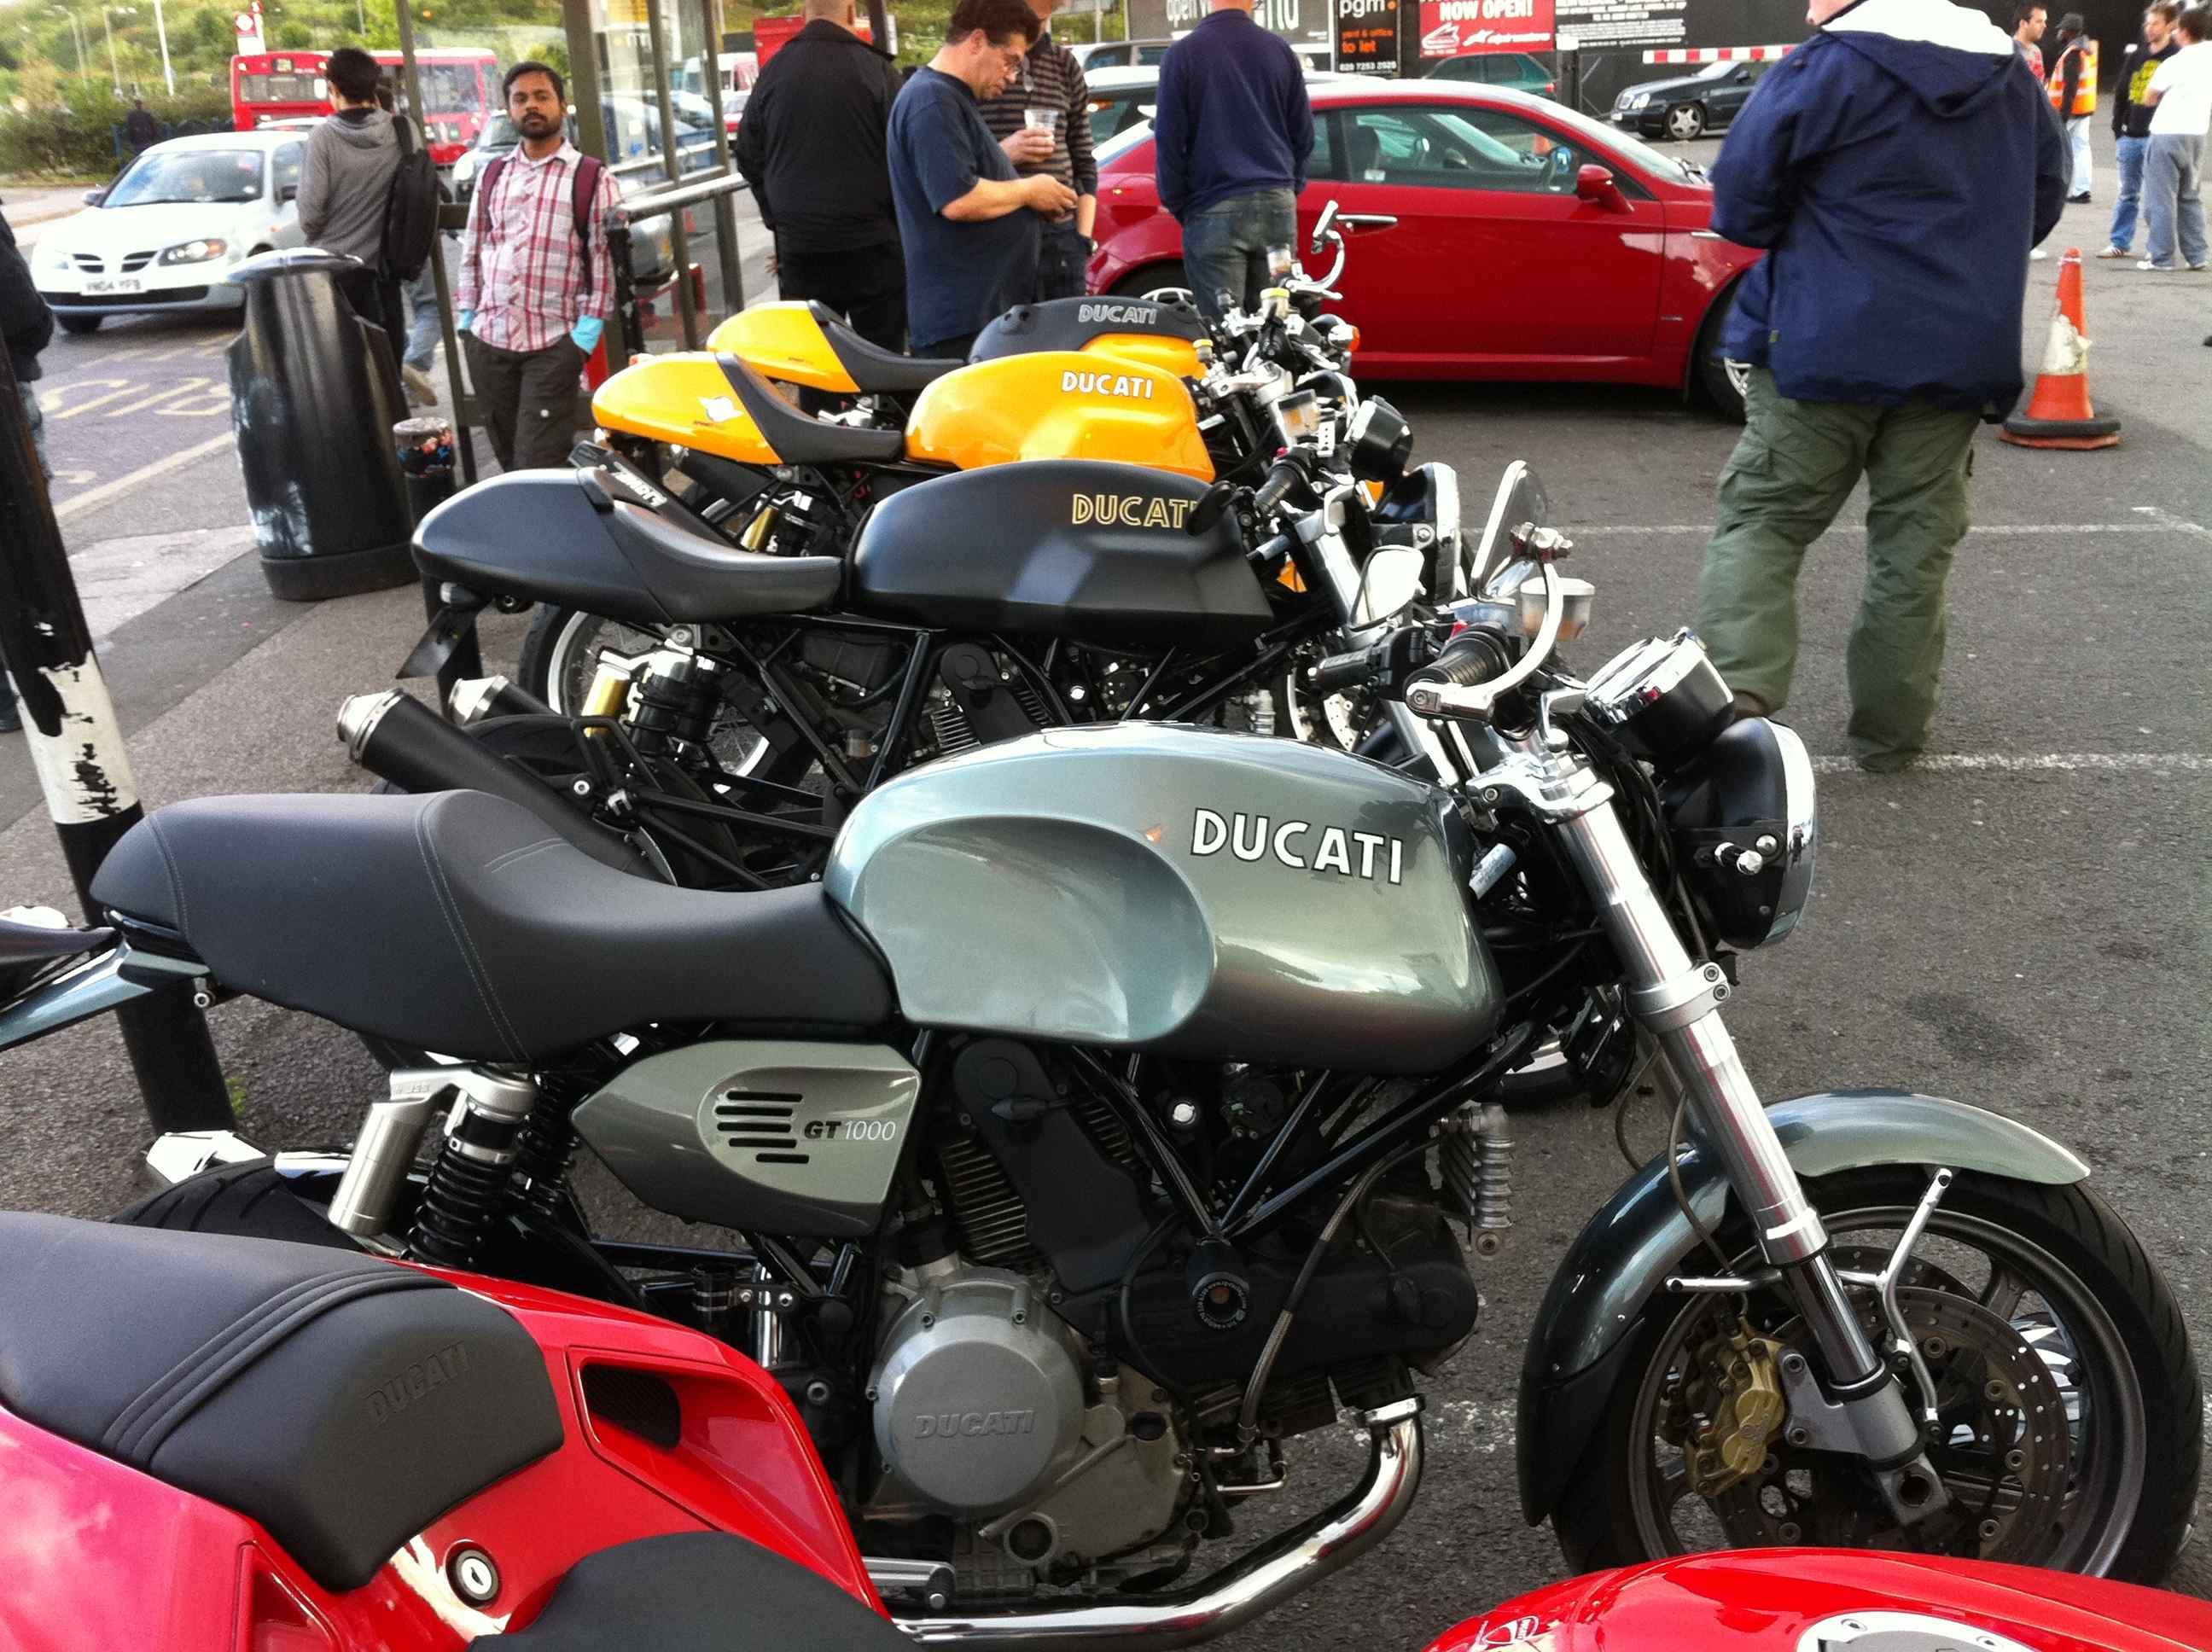 Ducati.ms - The Ultimate Ducati Forum - View Single Post - London(UK